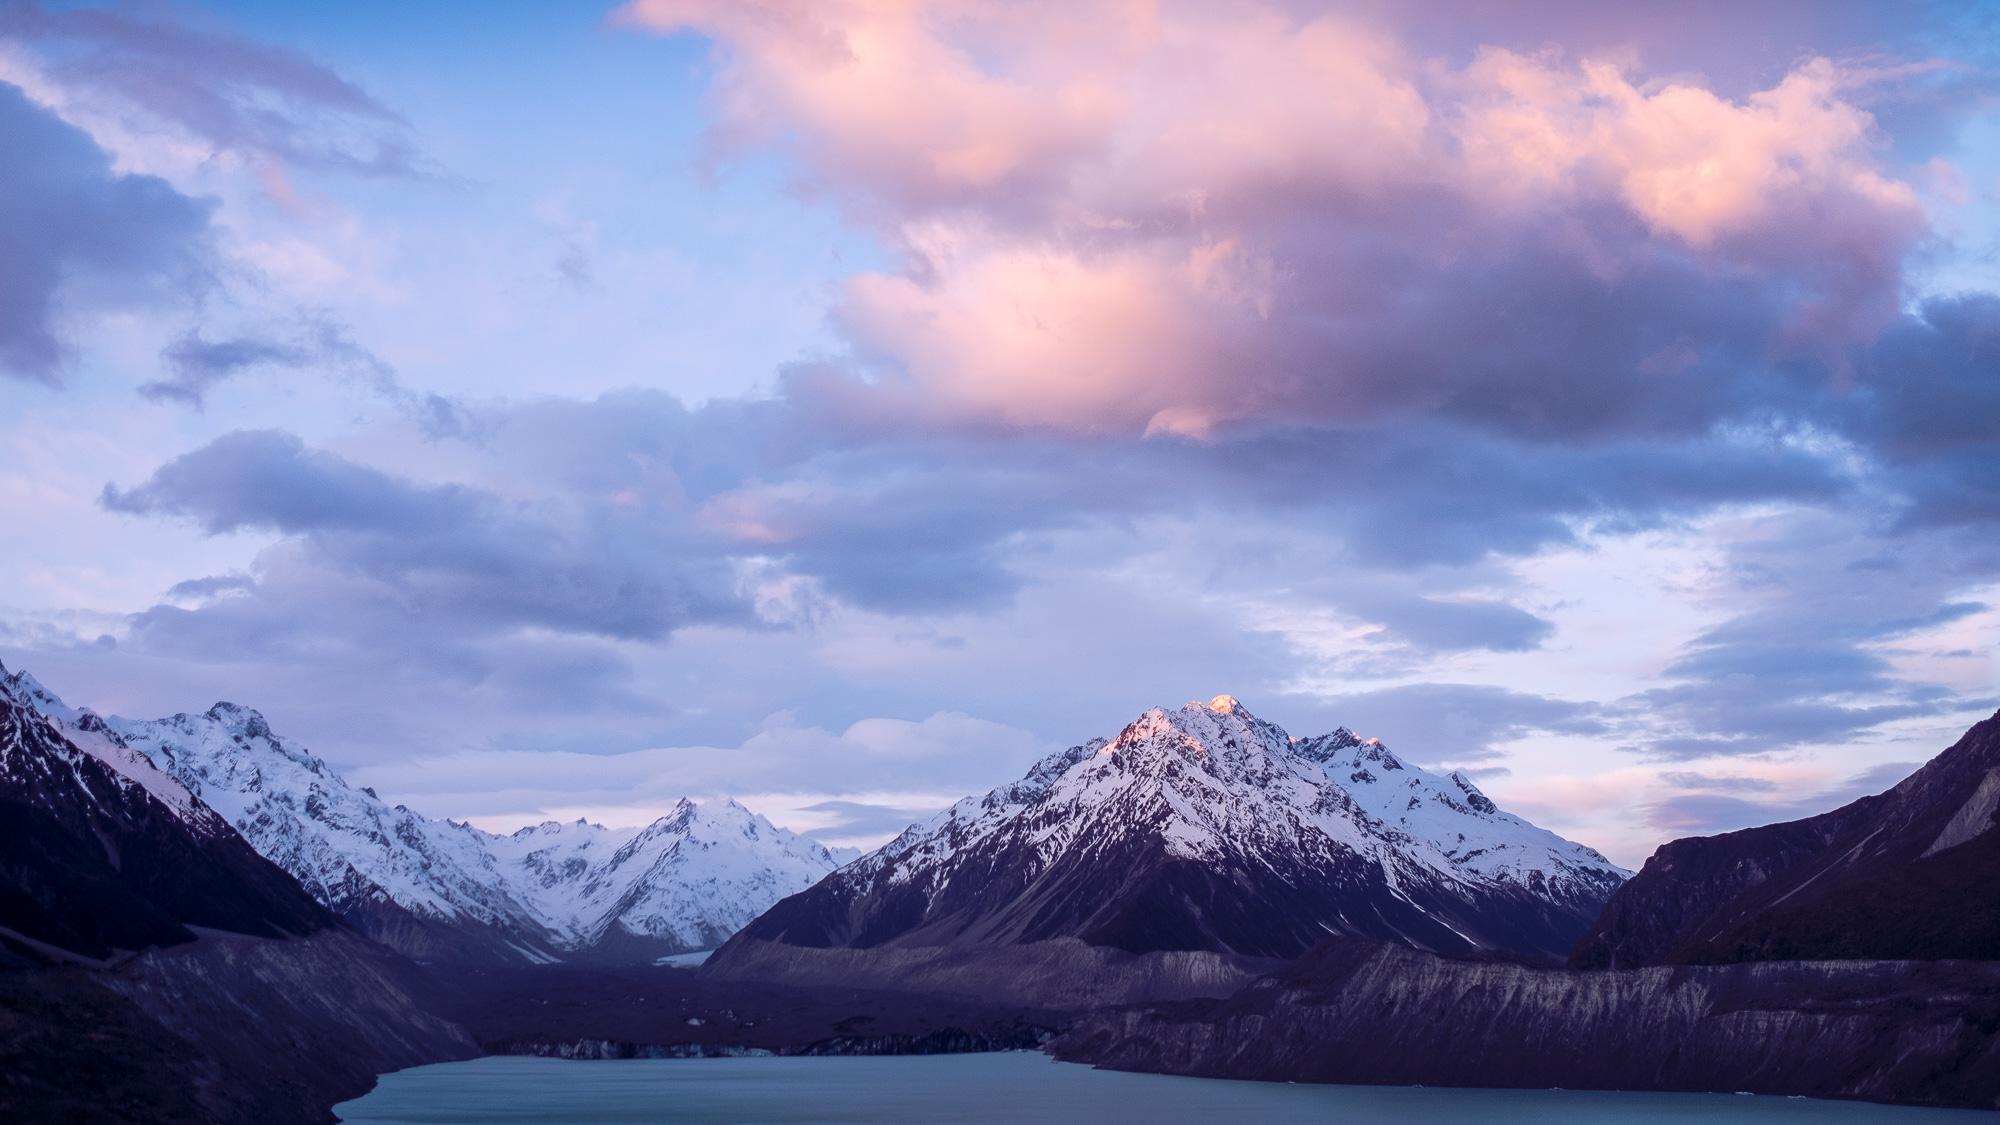 photography-workshop-newzealand-mountcook2018-33.jpg